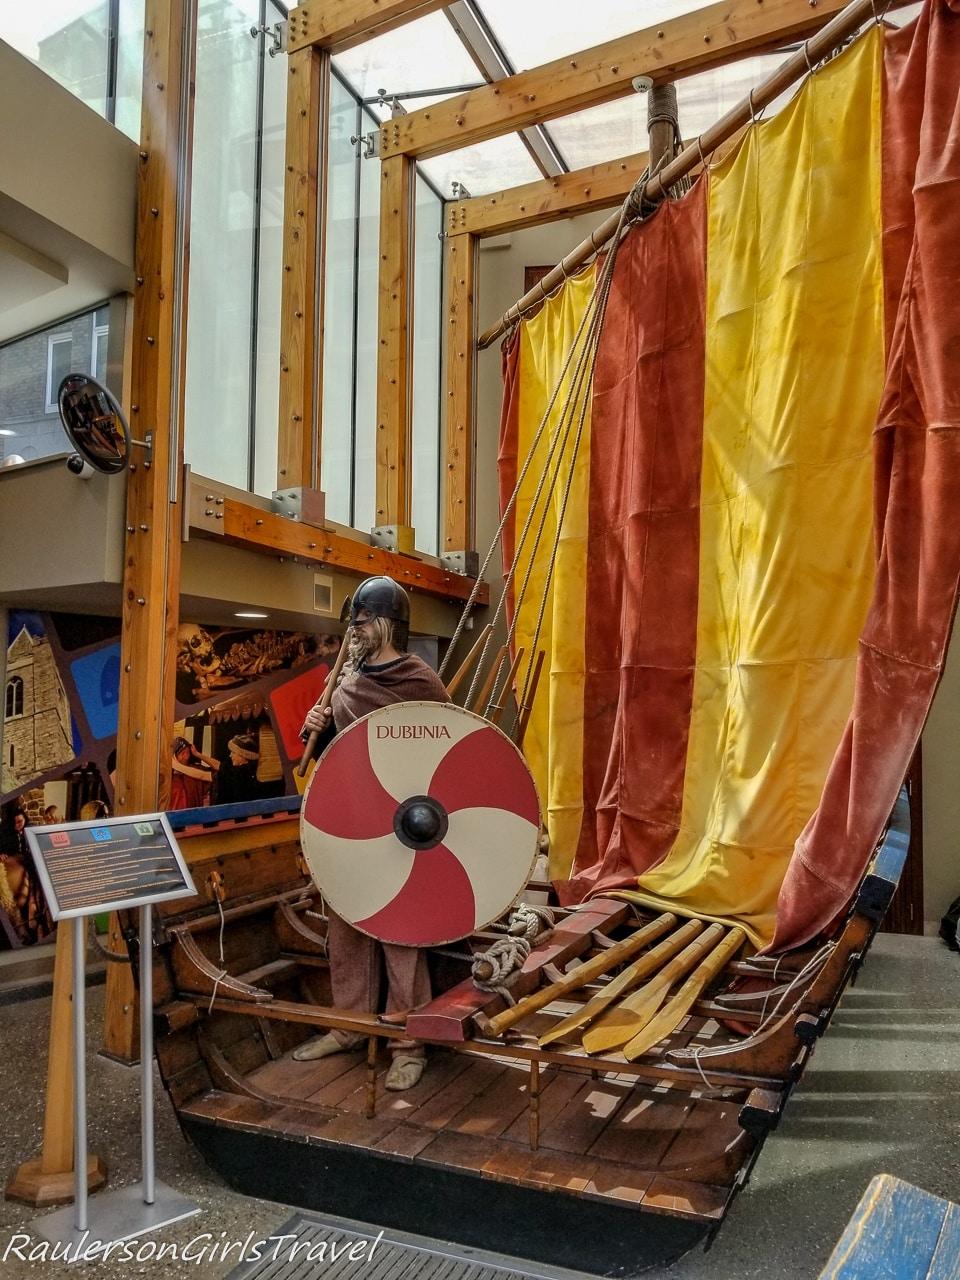 Inside Dublina Museum